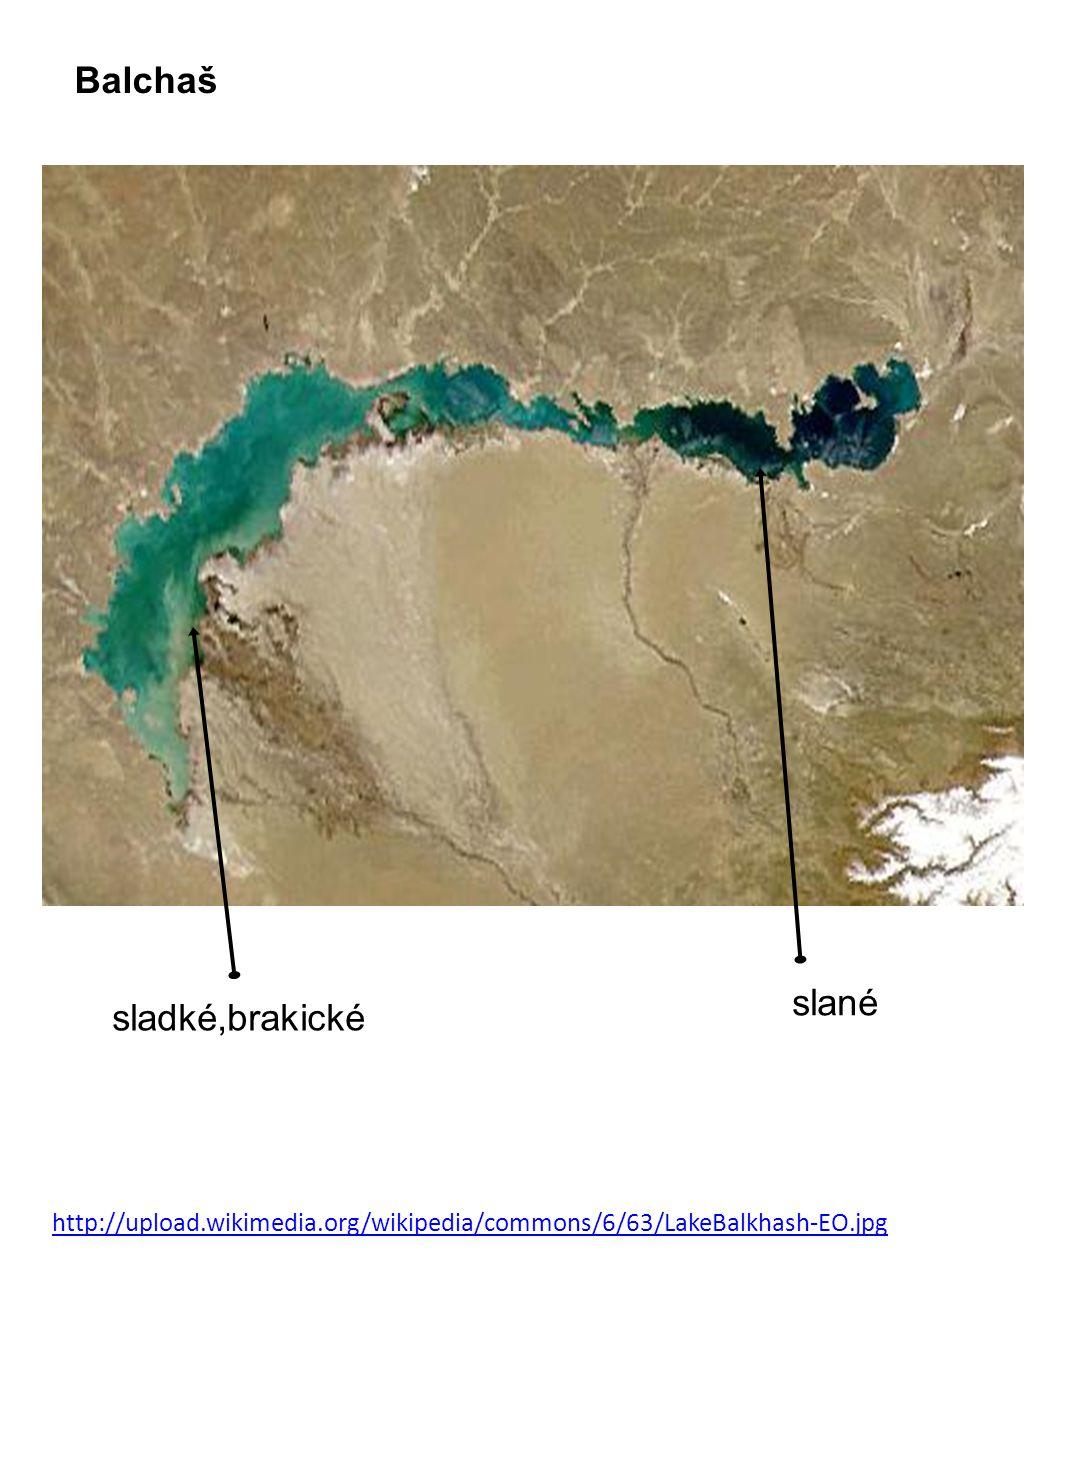 Balchaš slané sladké,brakické http://upload.wikimedia.org/wikipedia/commons/6/63/LakeBalkhash-EO.jpg